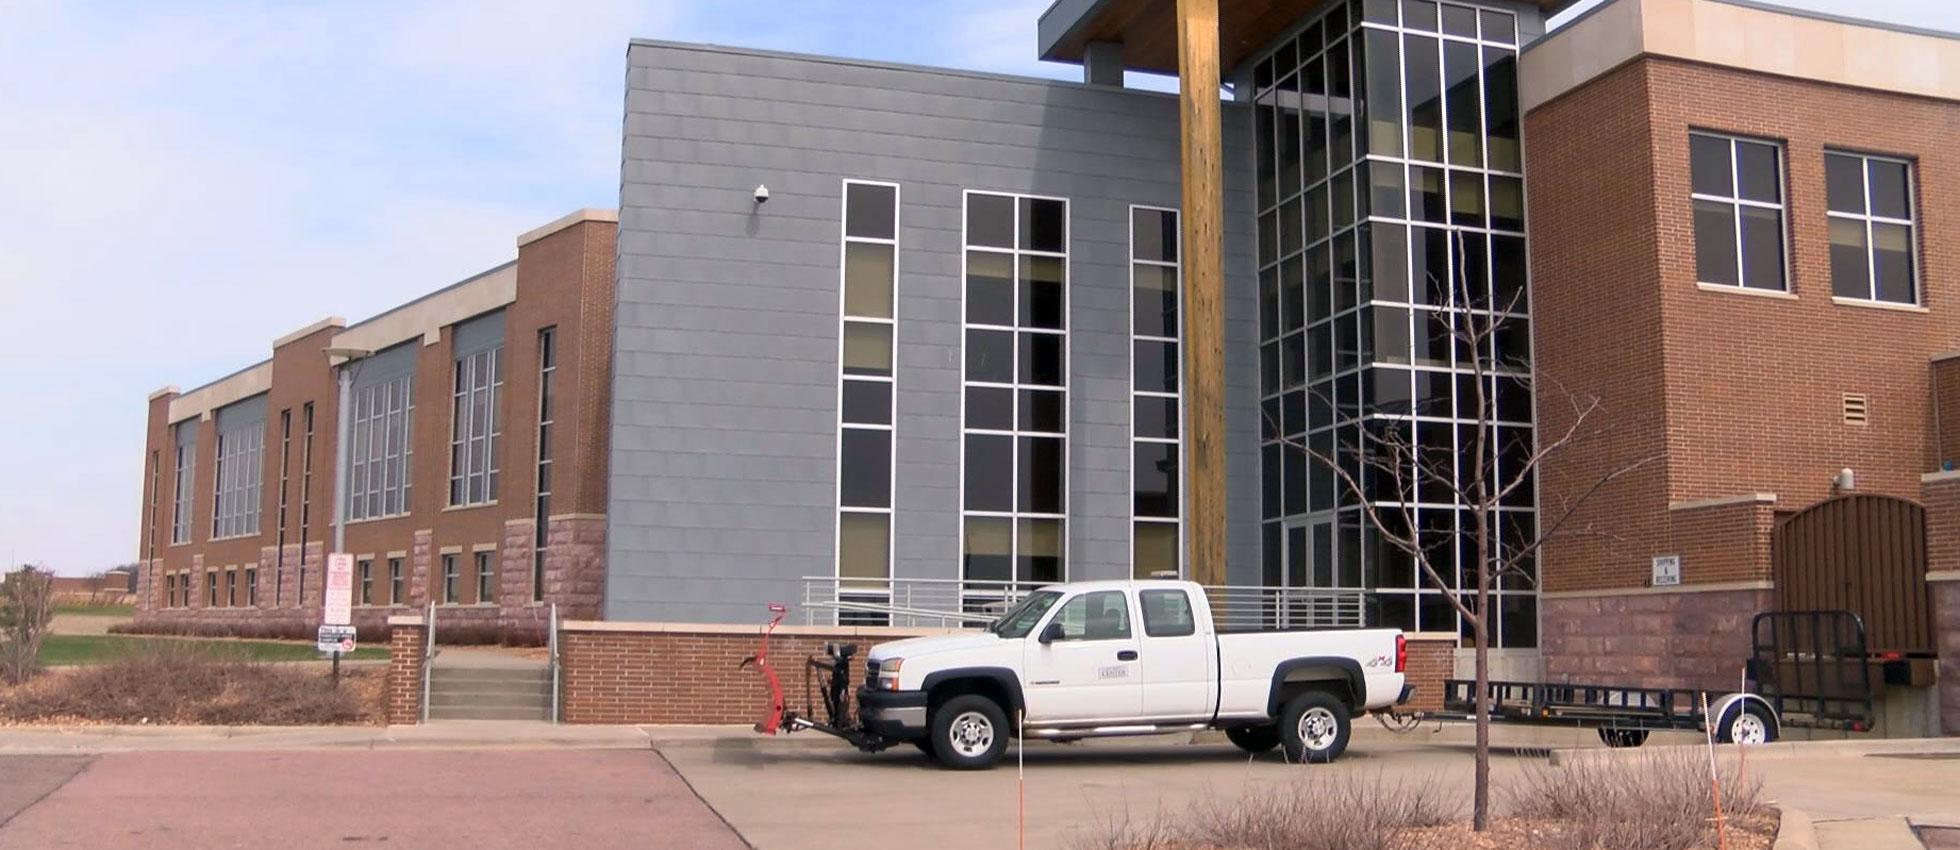 University Center Sioux Falls South Dakota